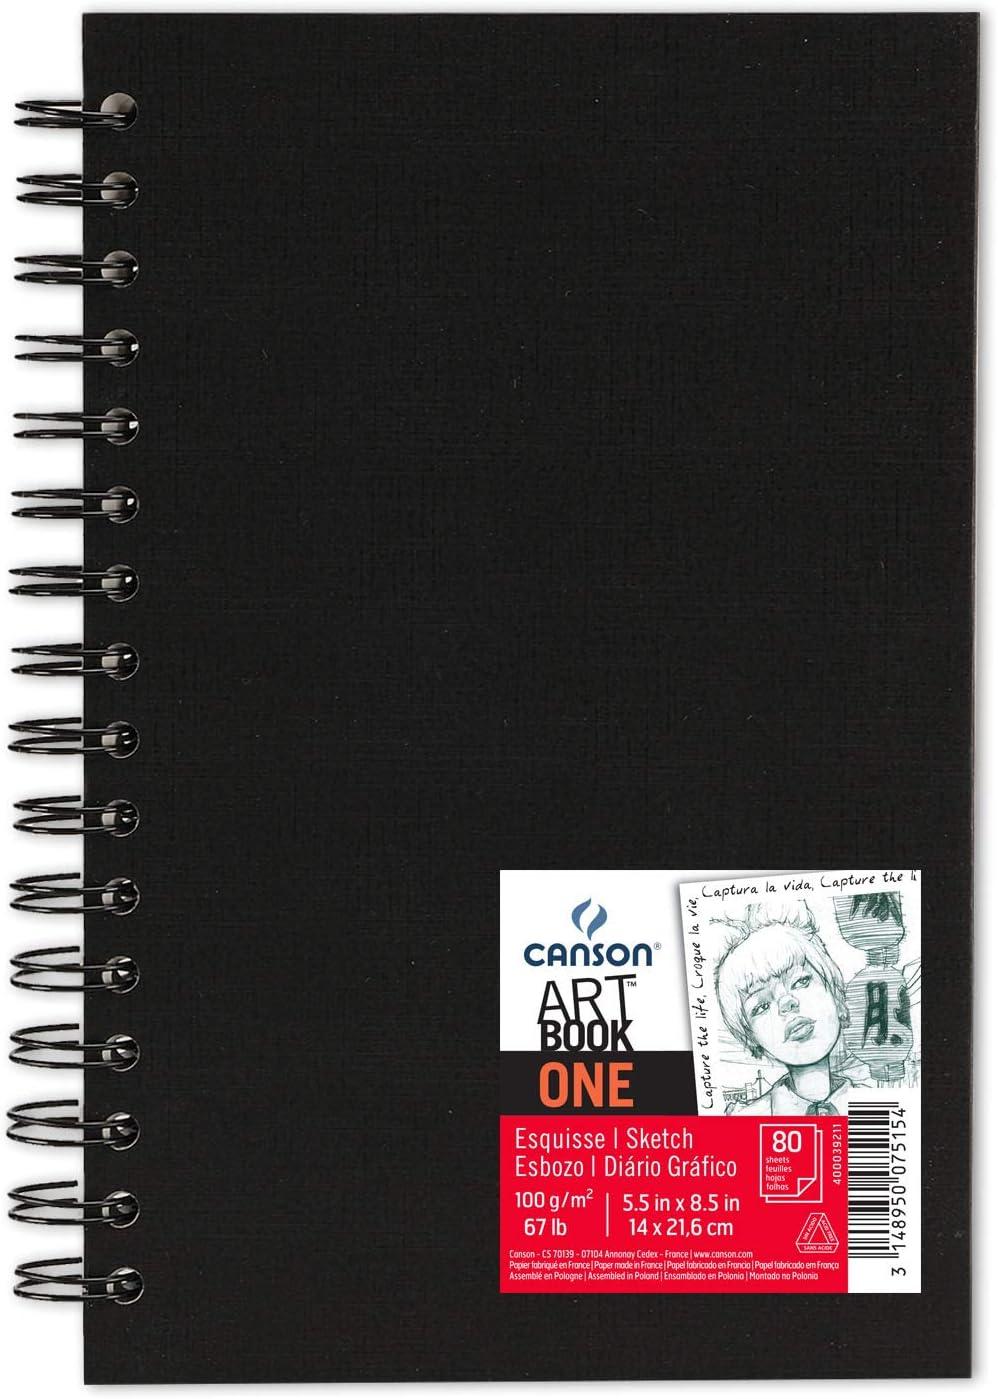 Álbum Espiral Microperforado, 14x21,6 cm, 80 Hojas, Canson Sketch One, Grano Fino 100g